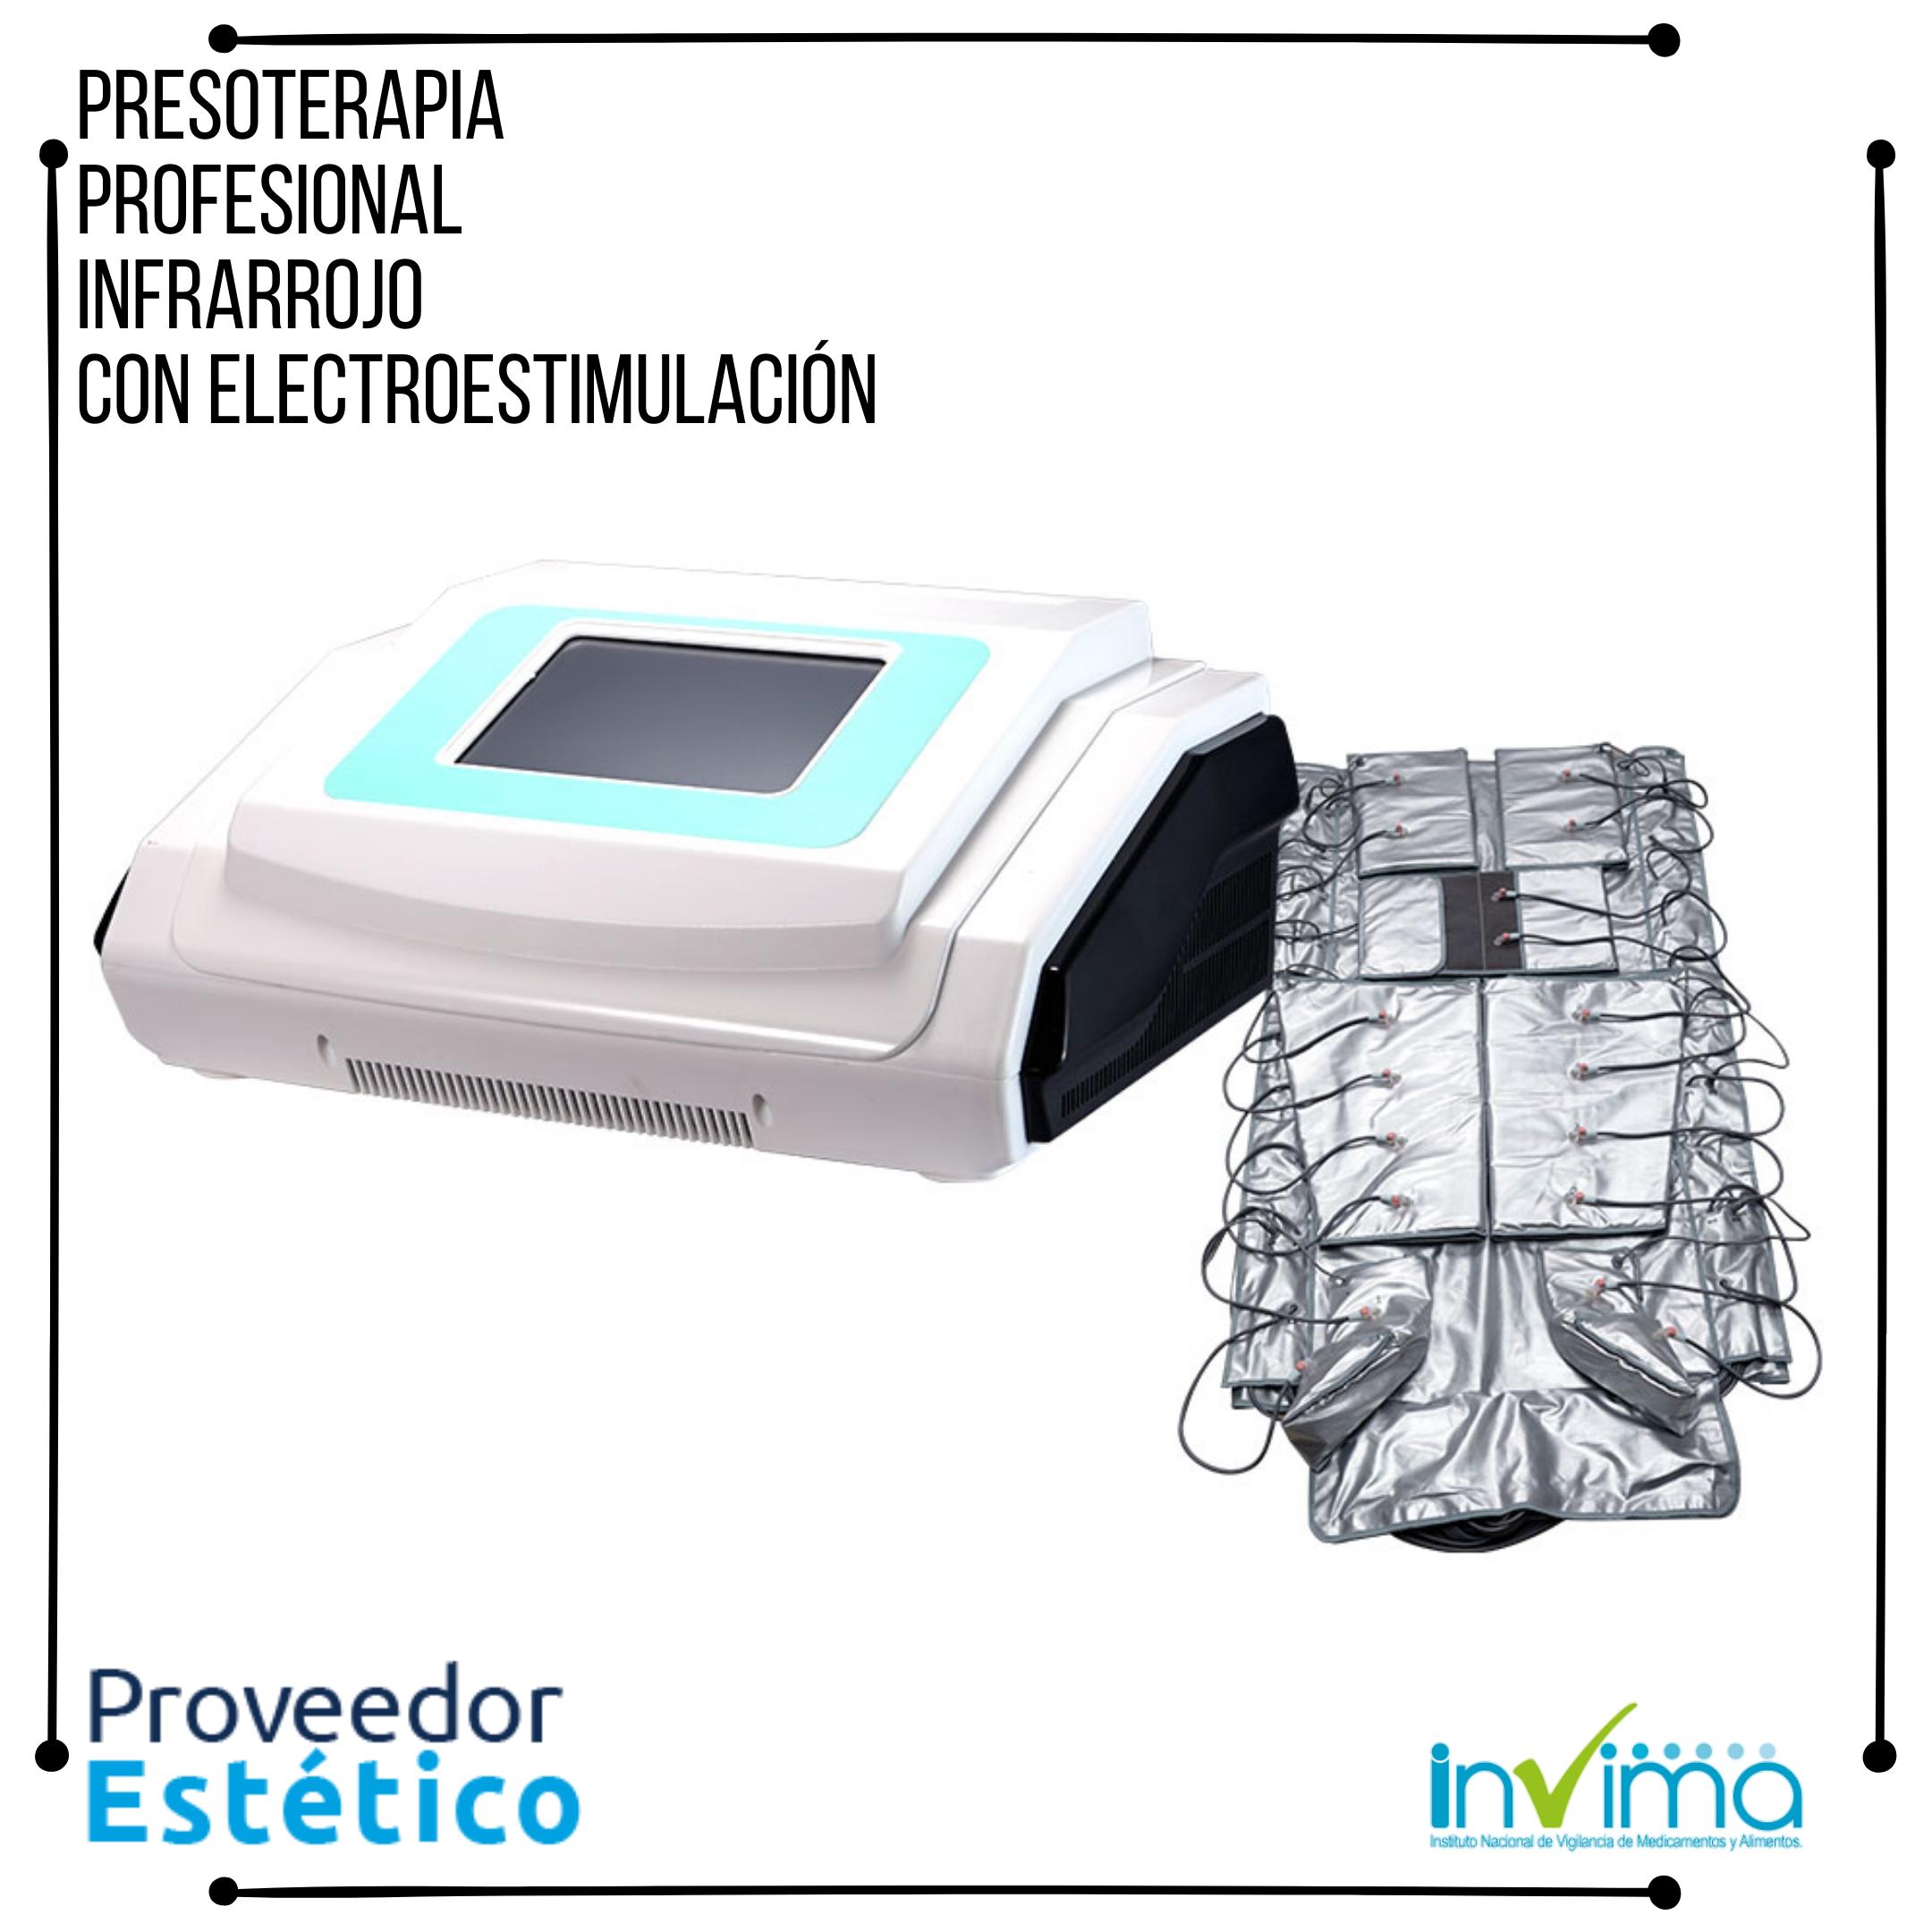 https://0201.nccdn.net/1_2/000/000/159/b64/presoterapia-infrarroja--1-.png